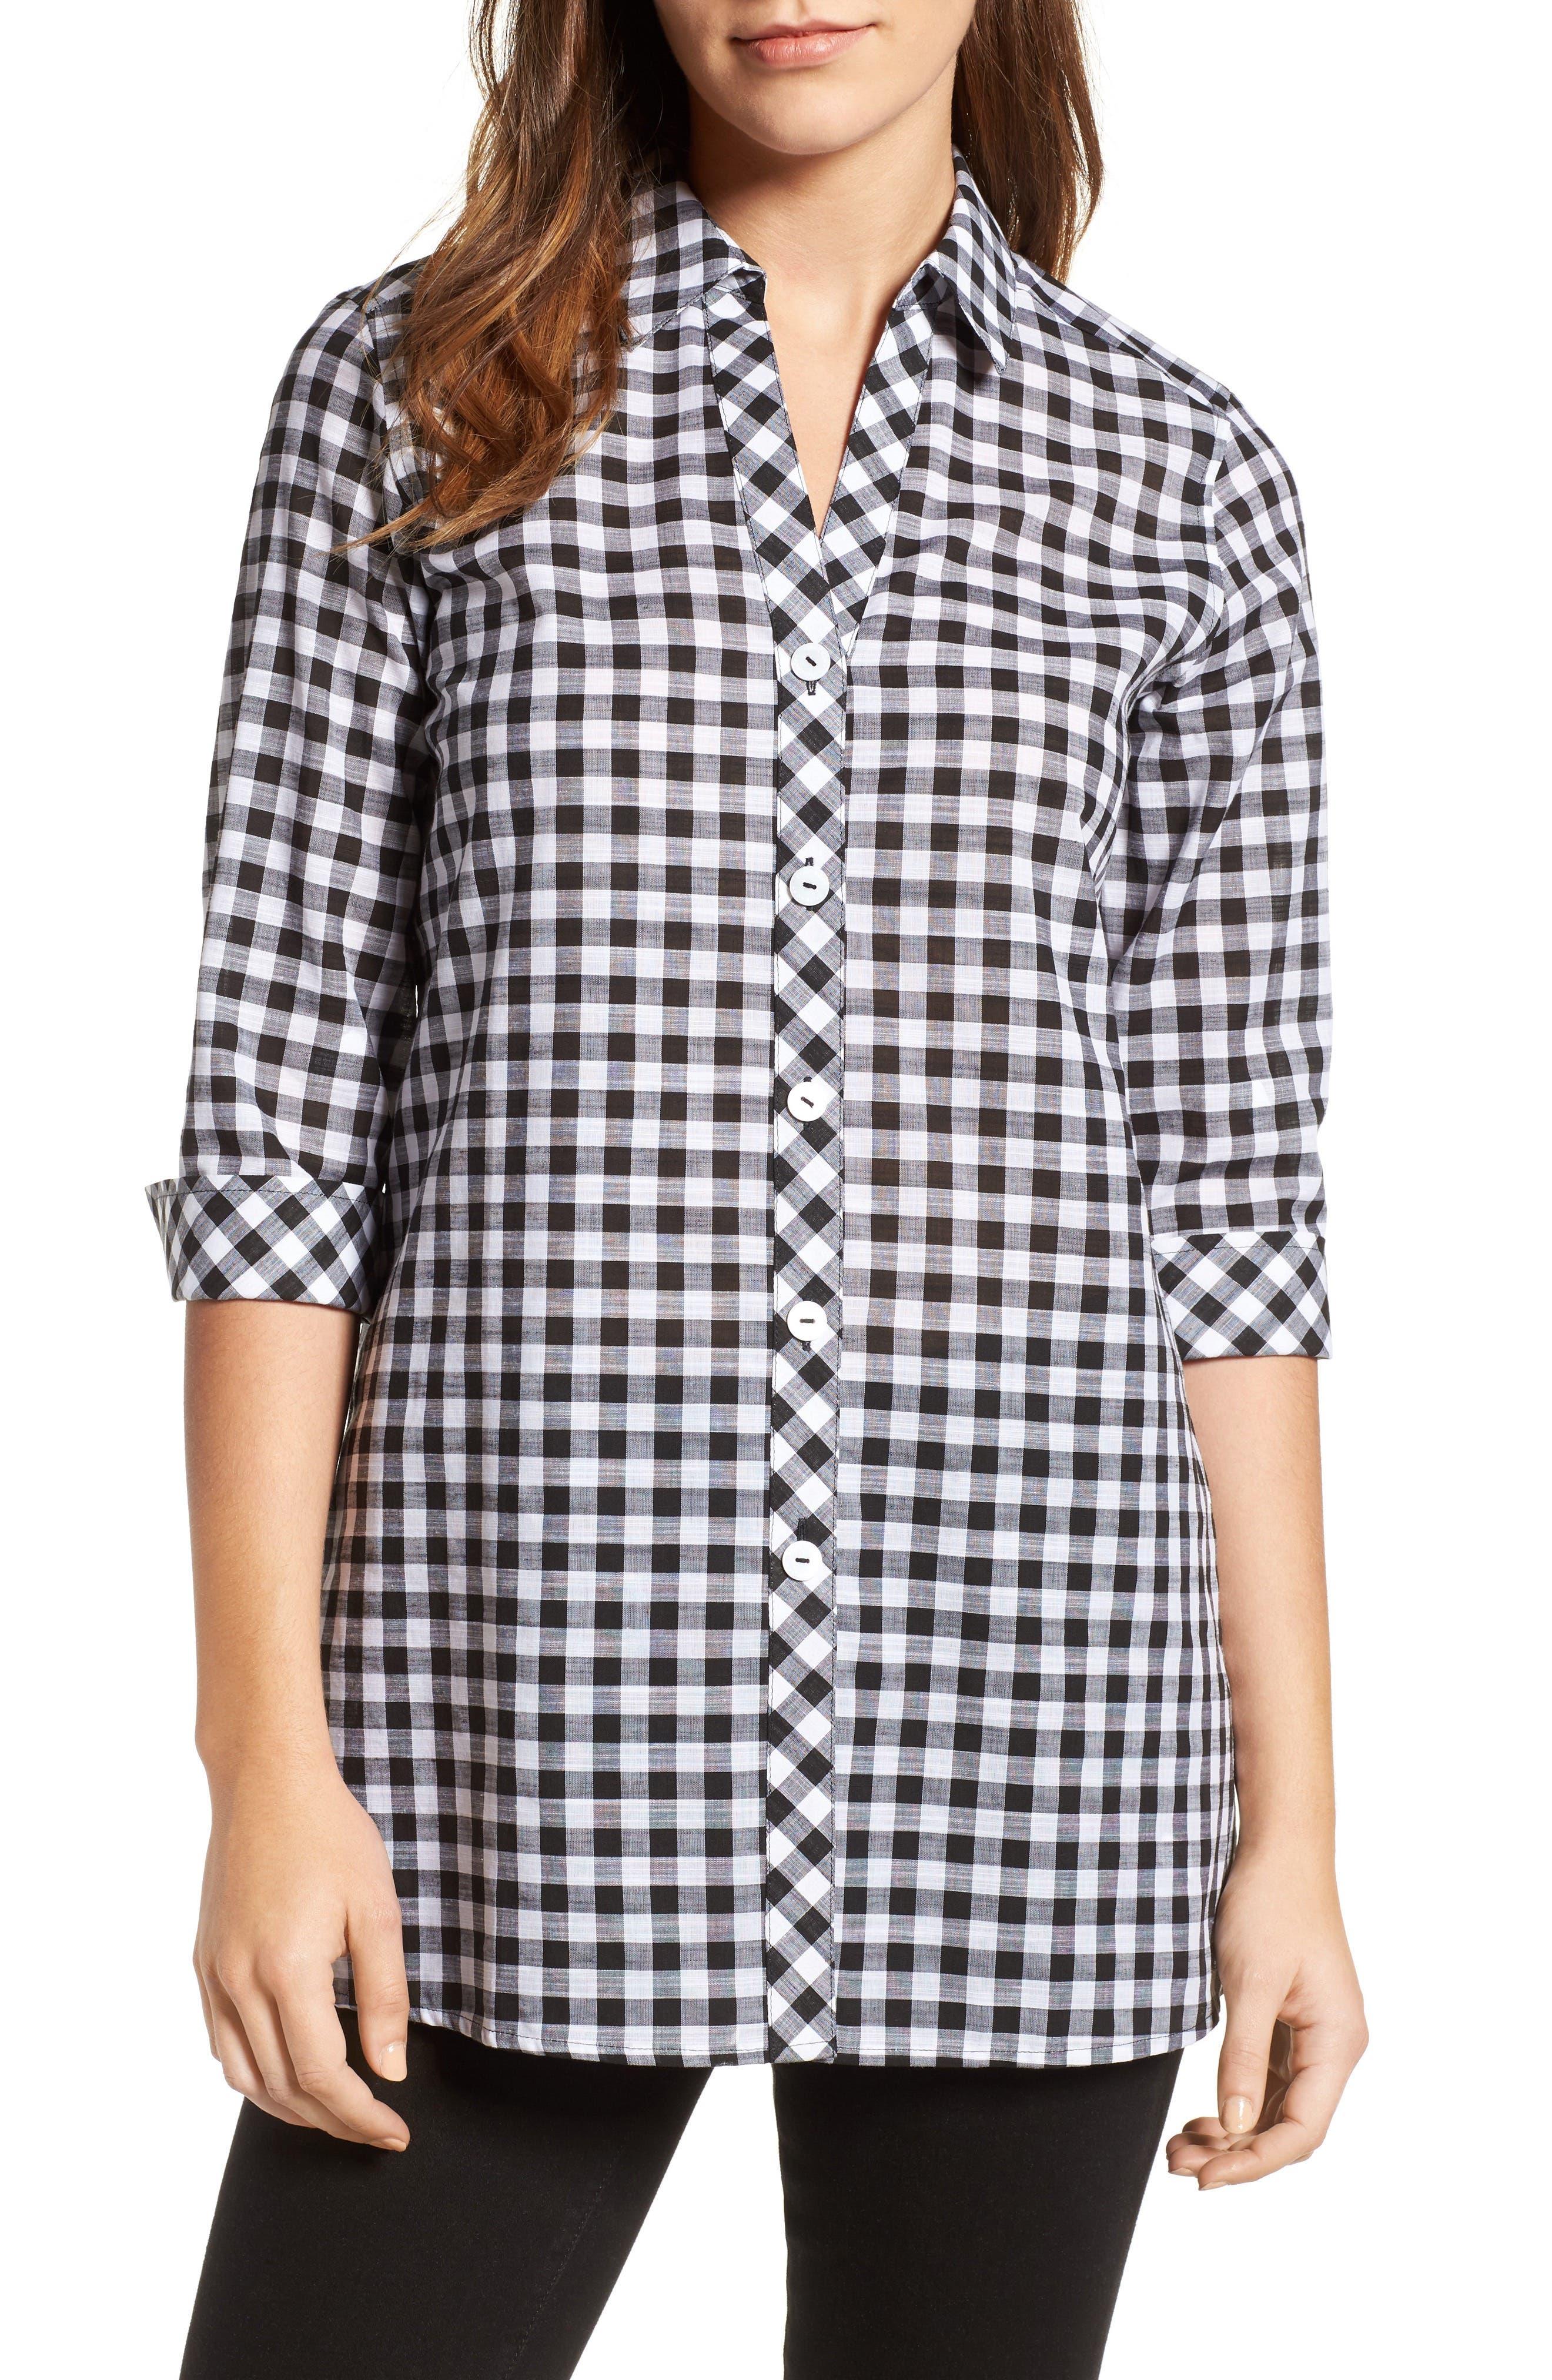 Main Image - Foxcroft Gingham Cotton Tunic Shirt (Regular & Petite)